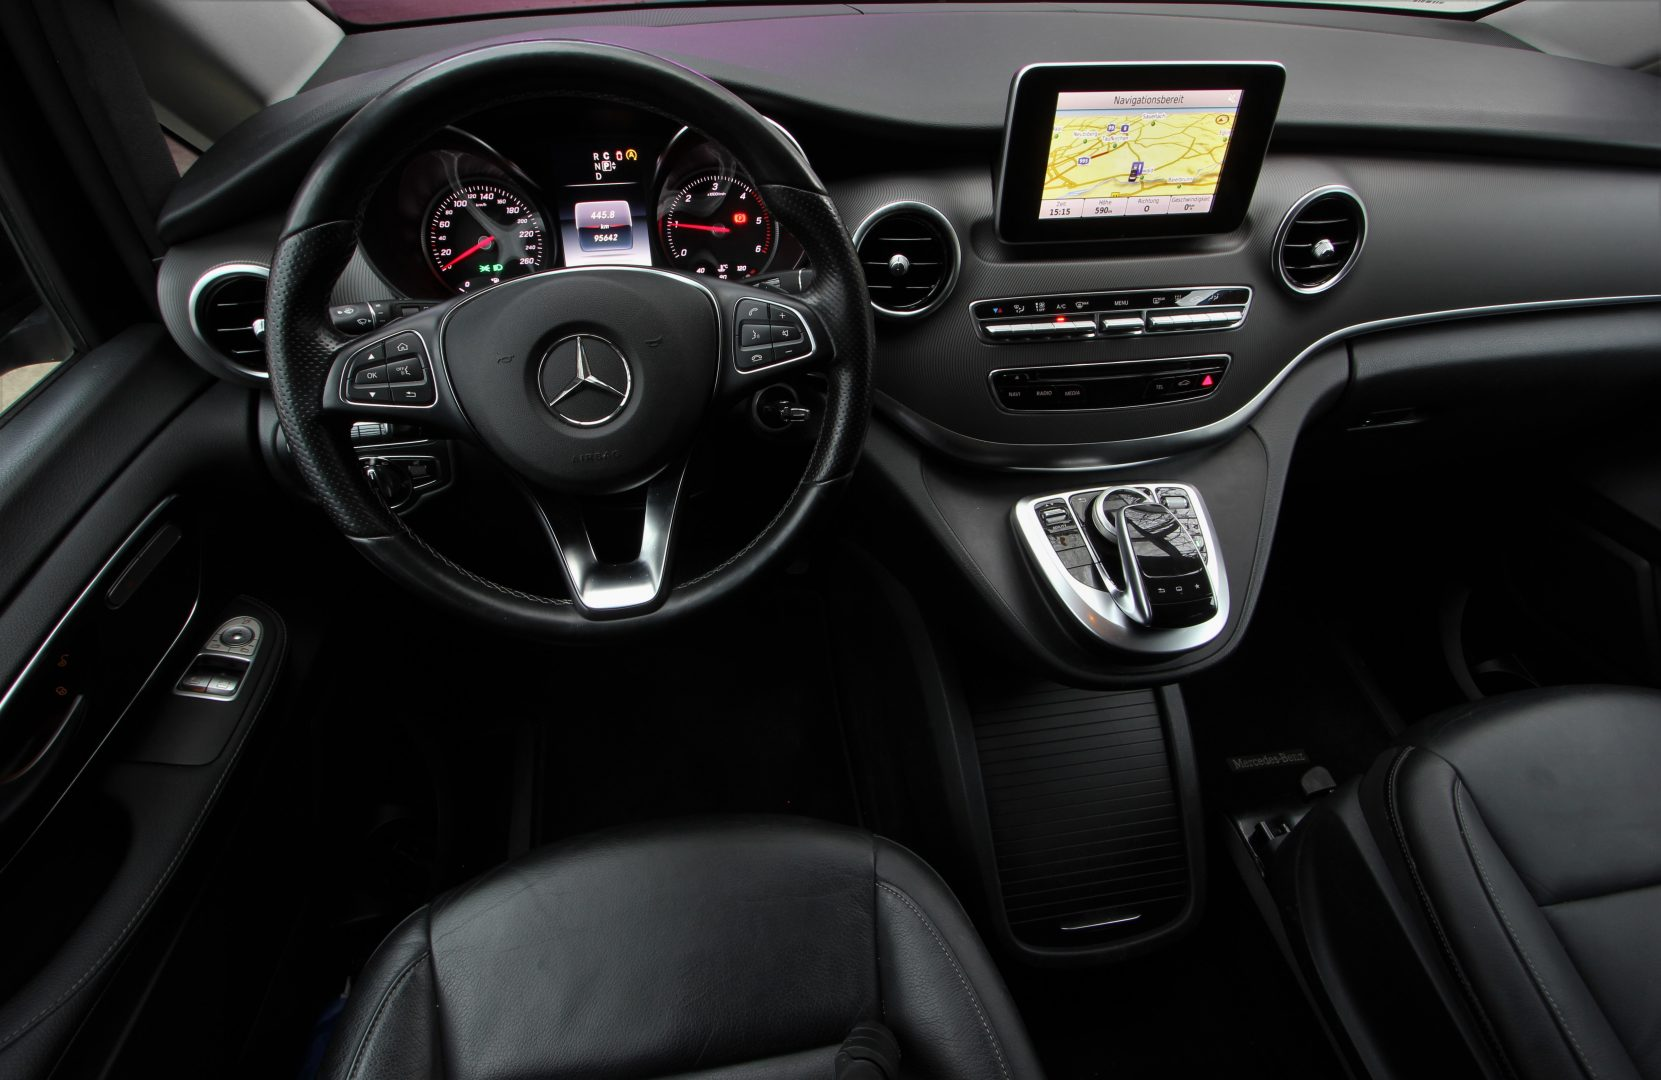 AIL Mercedes-Benz V 250 CDI/BT/d AVANTGARD LED  3